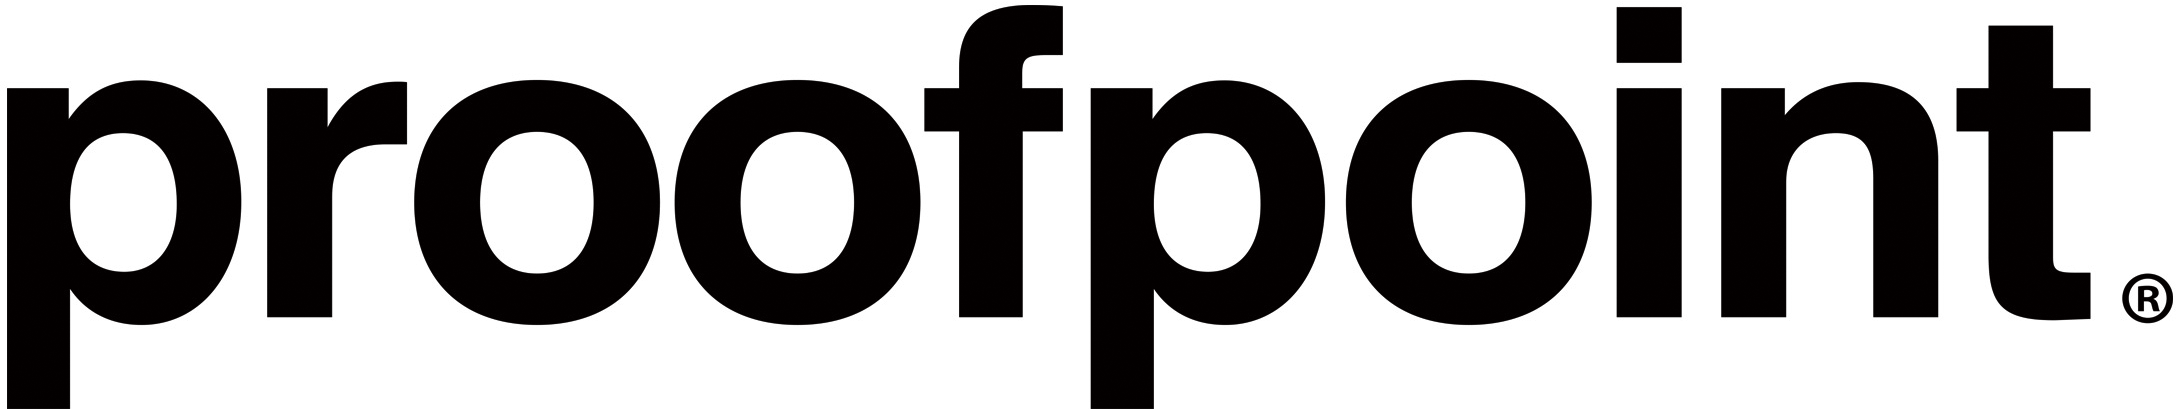 Proofpoint-logo-reg-K